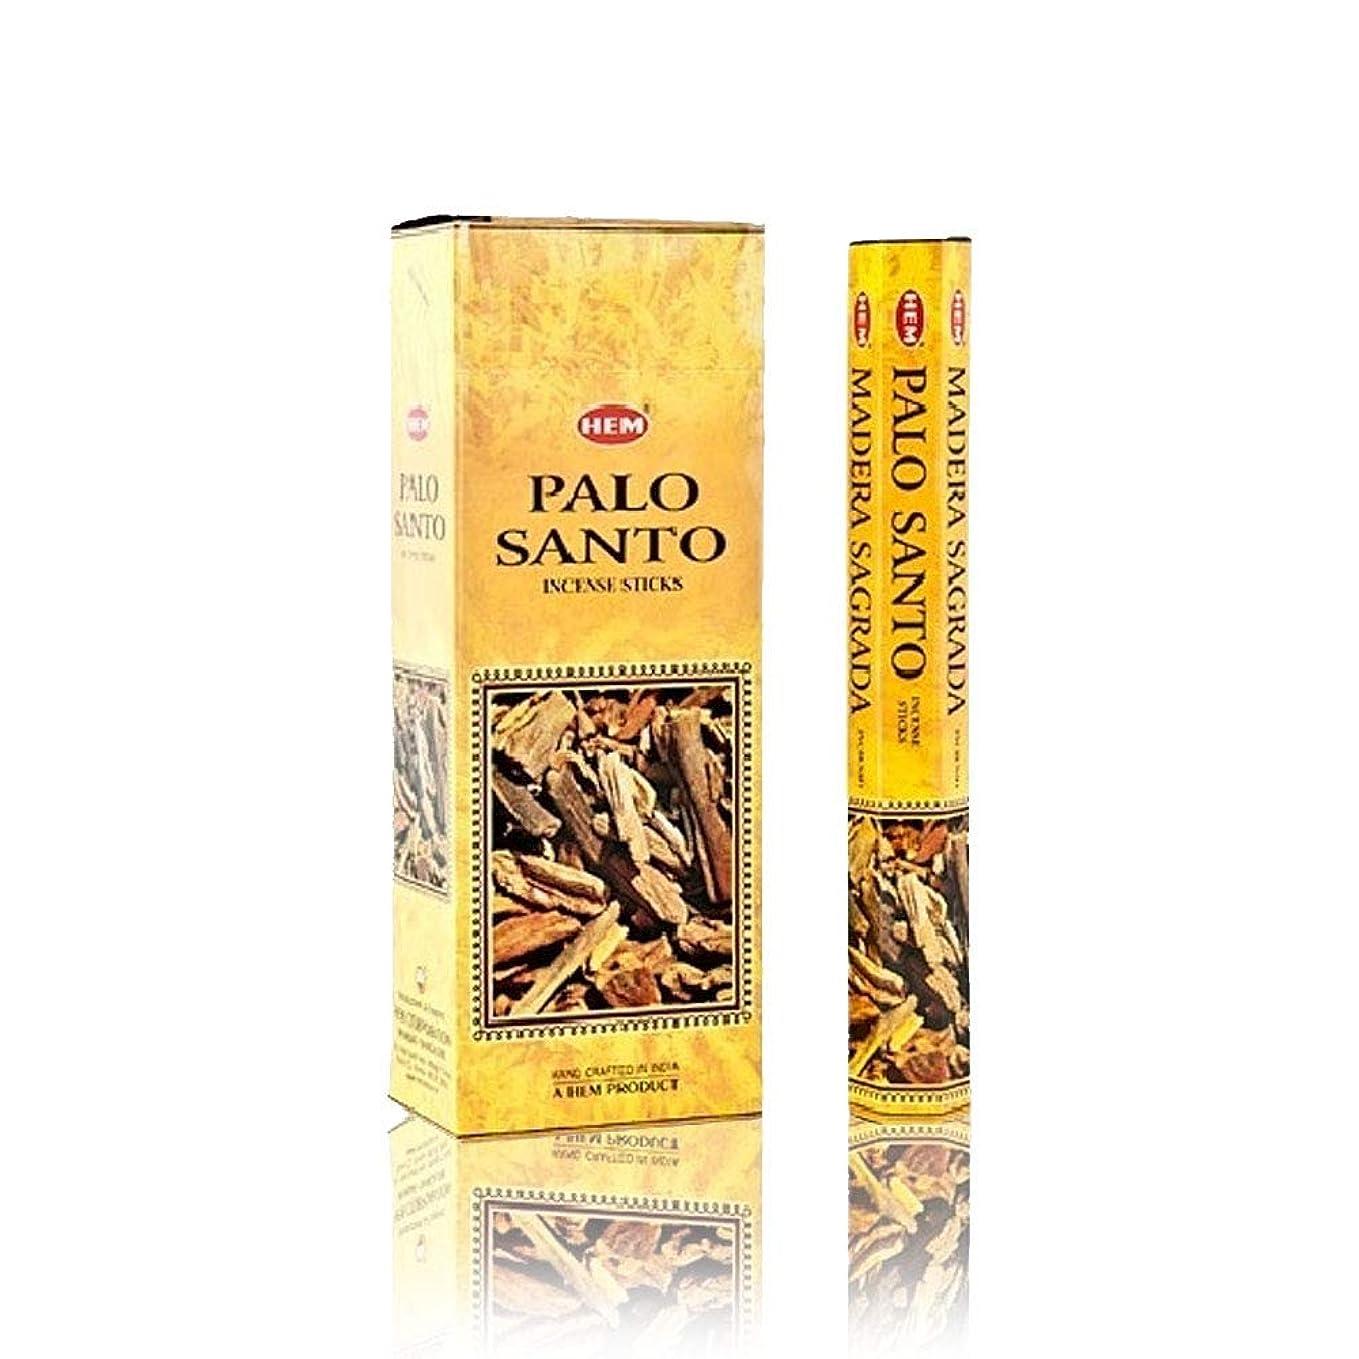 HEM インセンススティック 120本パック-Palo Santo (6 x 20)